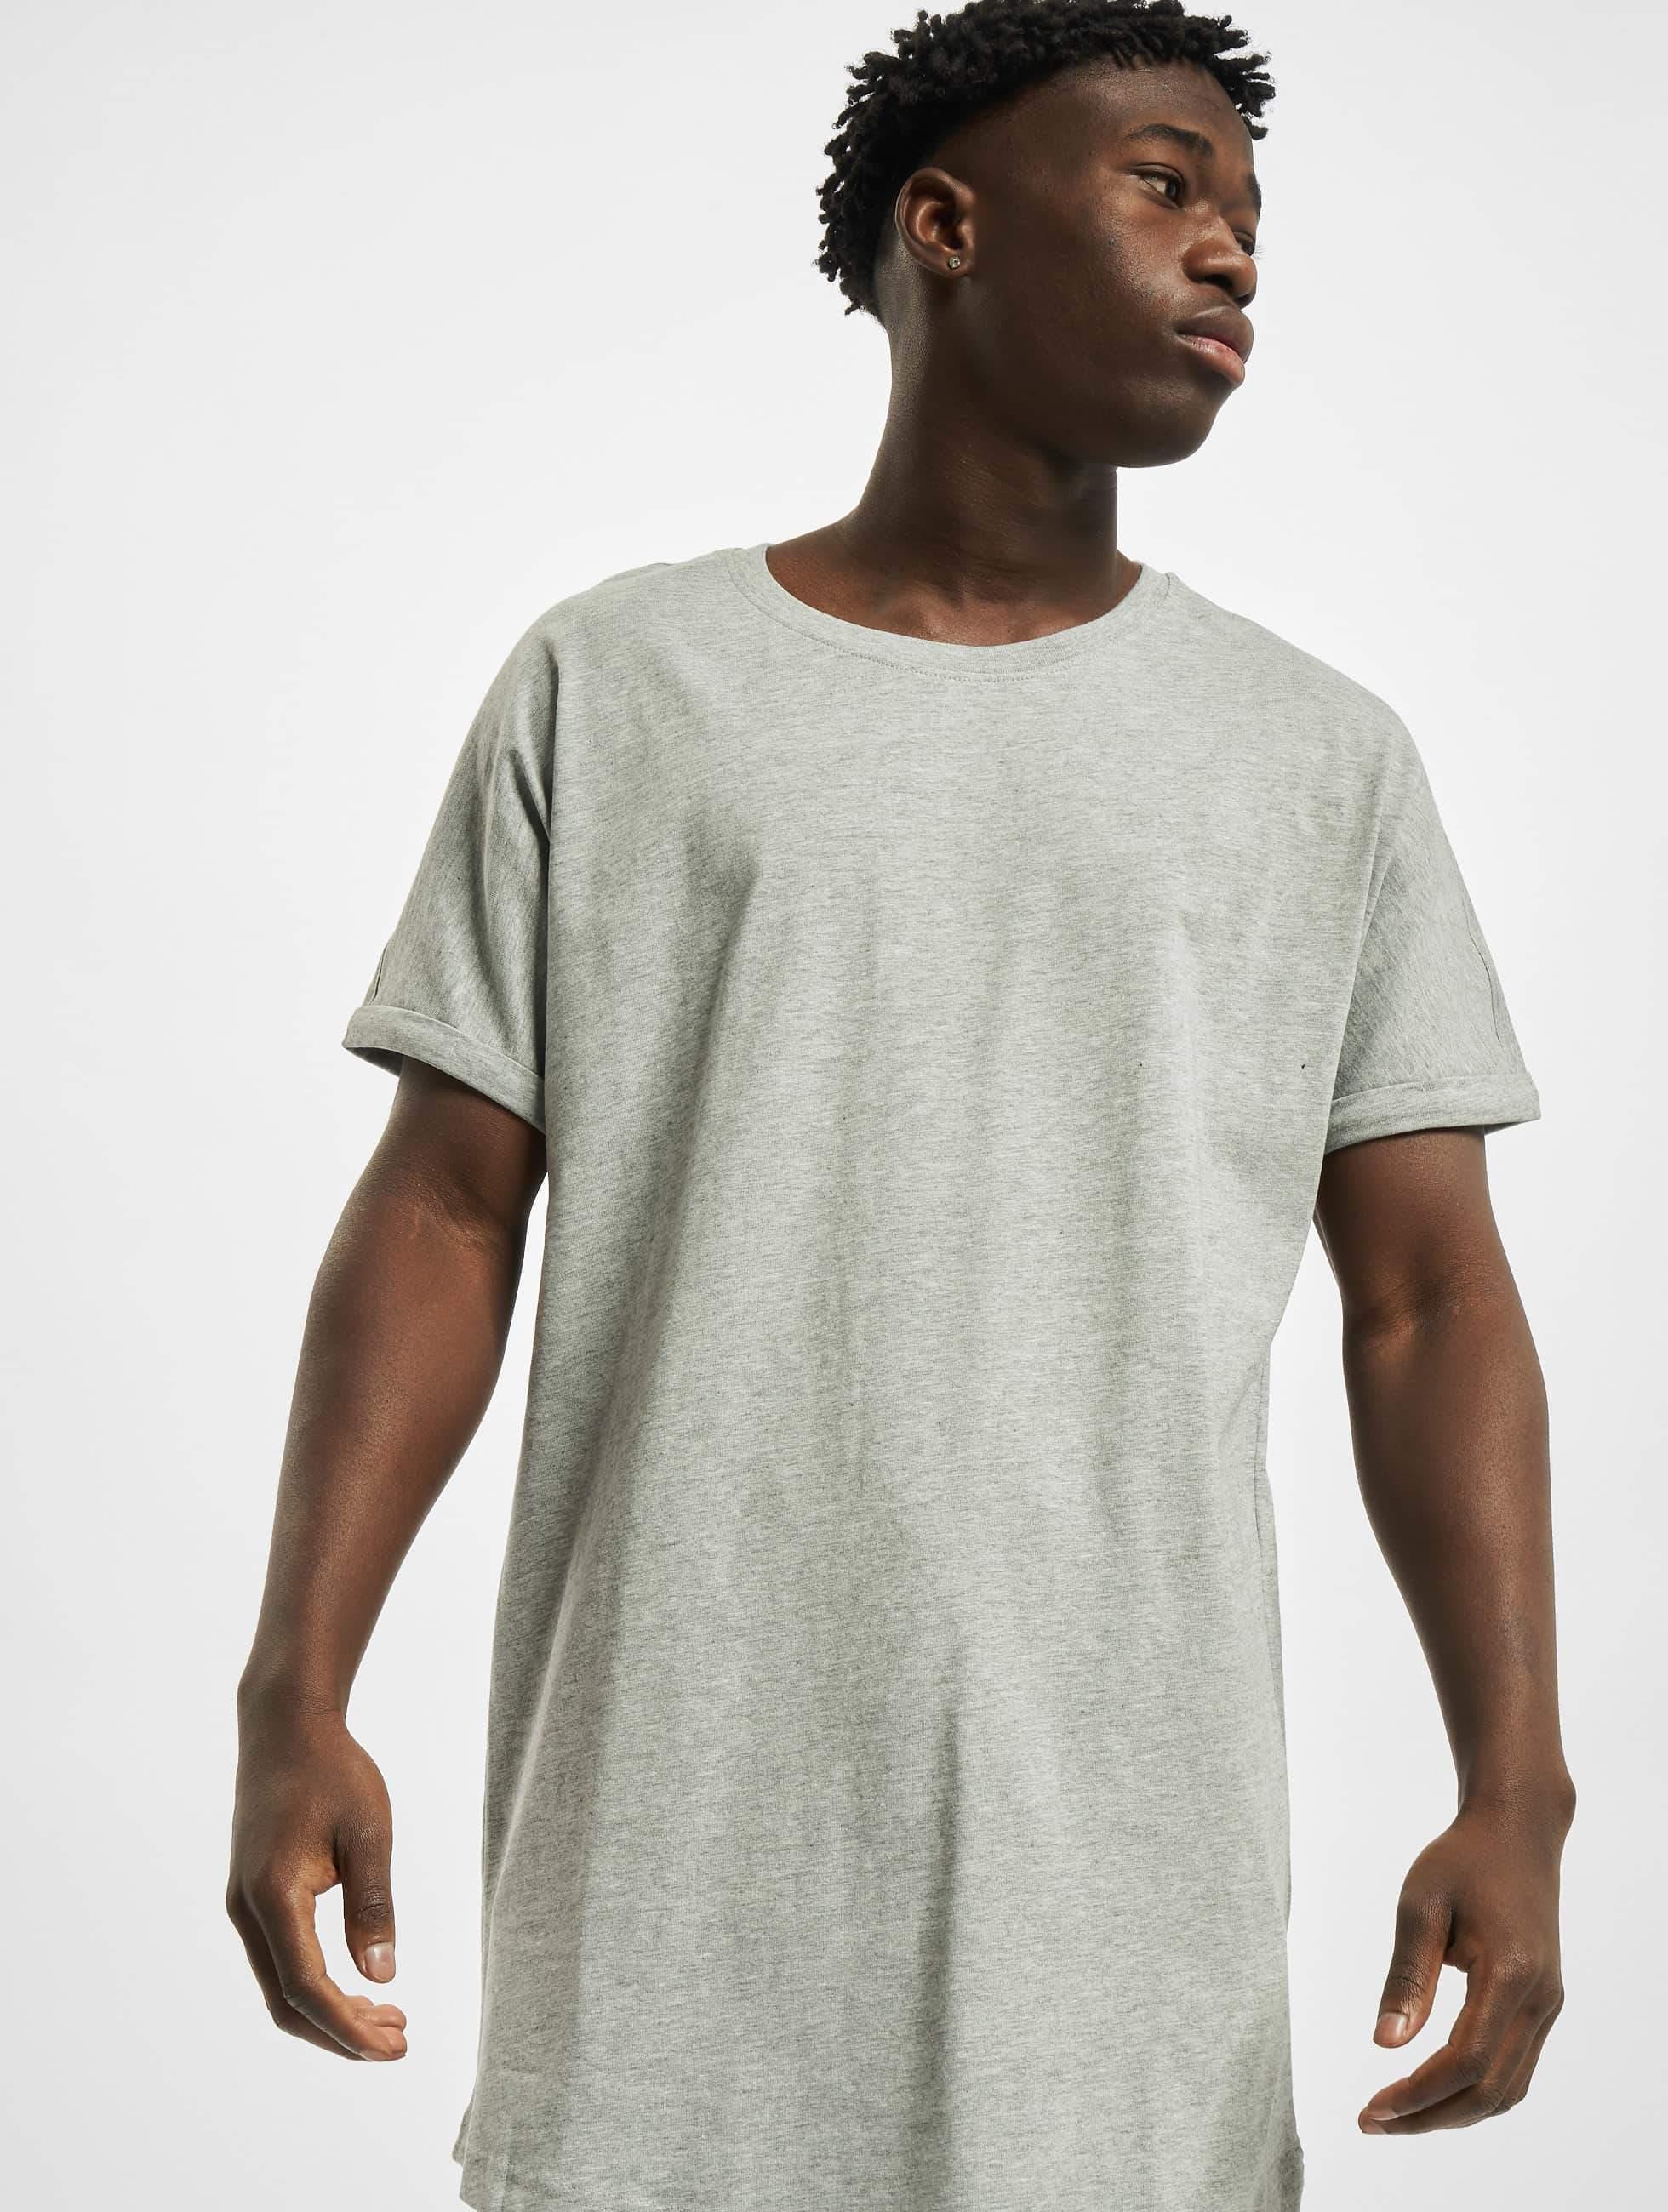 Urban Classics Long Shaped Turnup T Shirt Grey